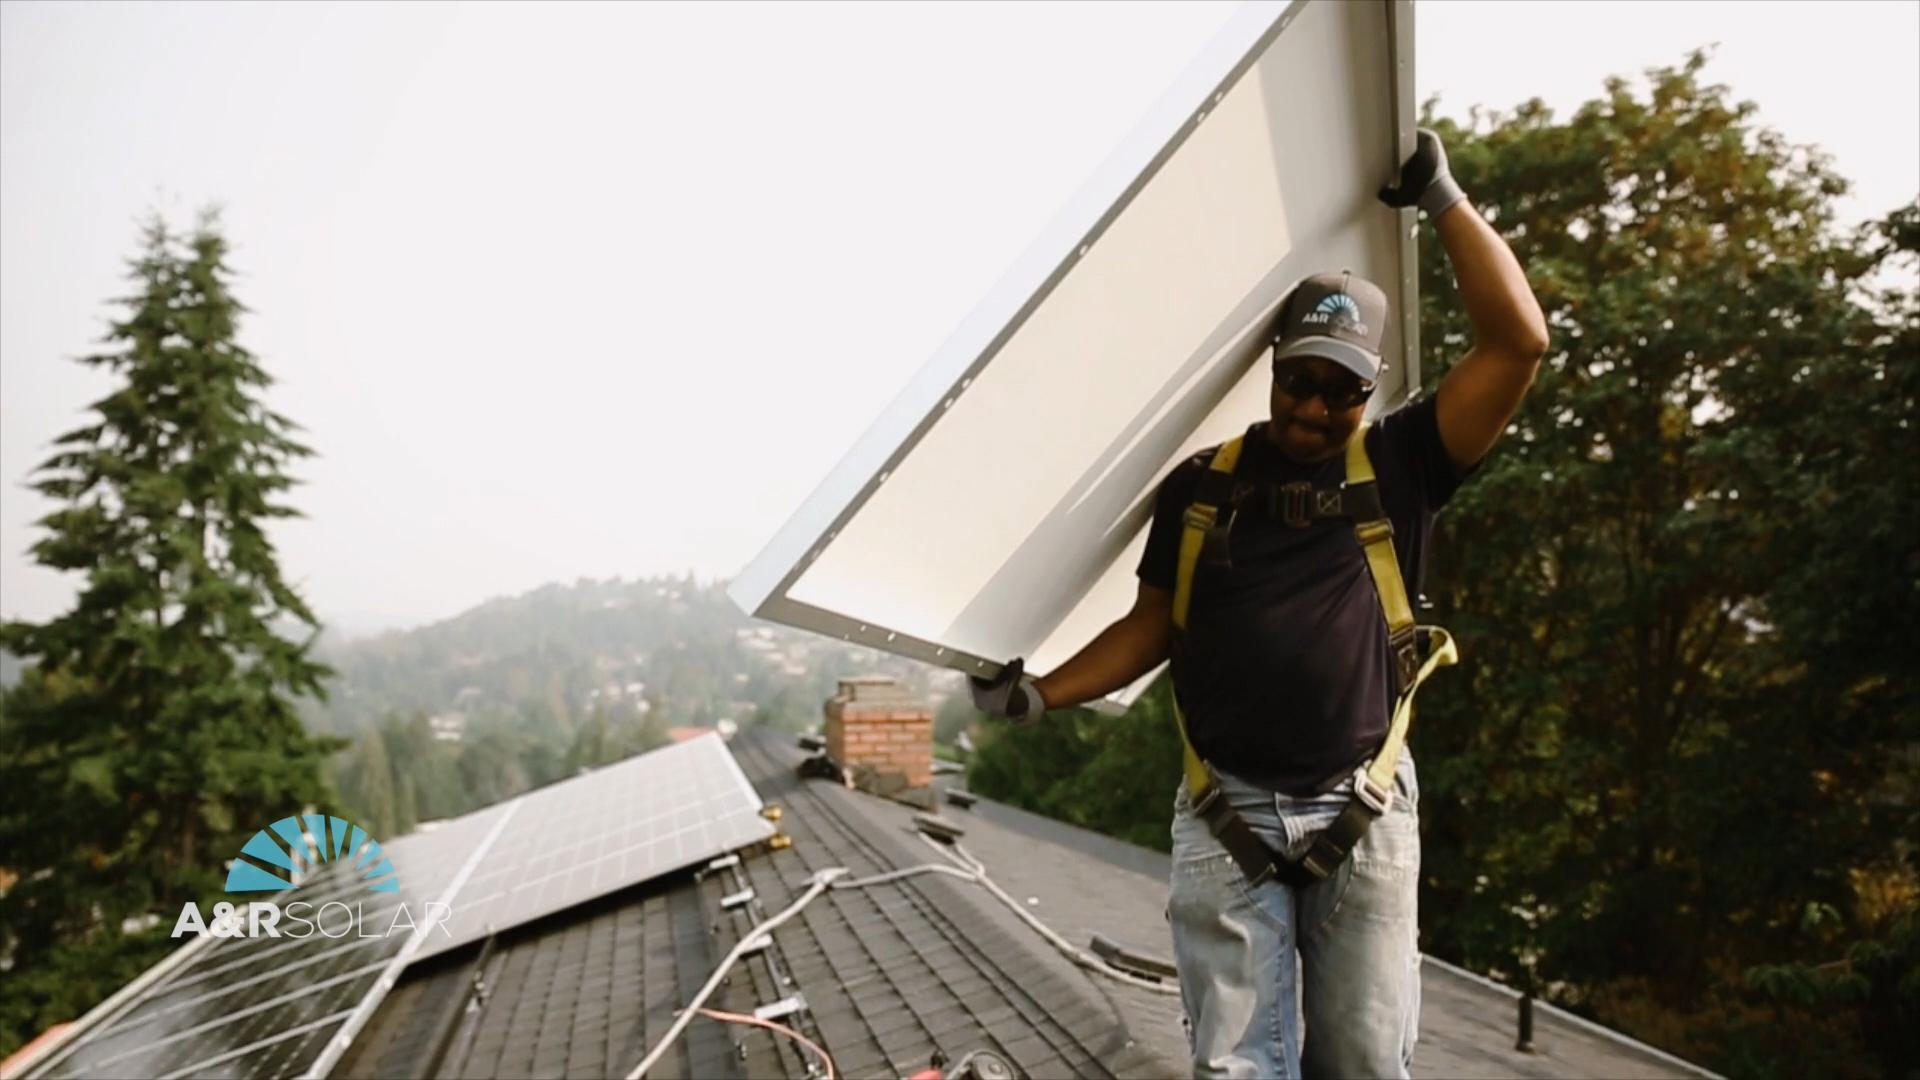 Solar Jobs - Electricians, Installers & More | A&R Solar